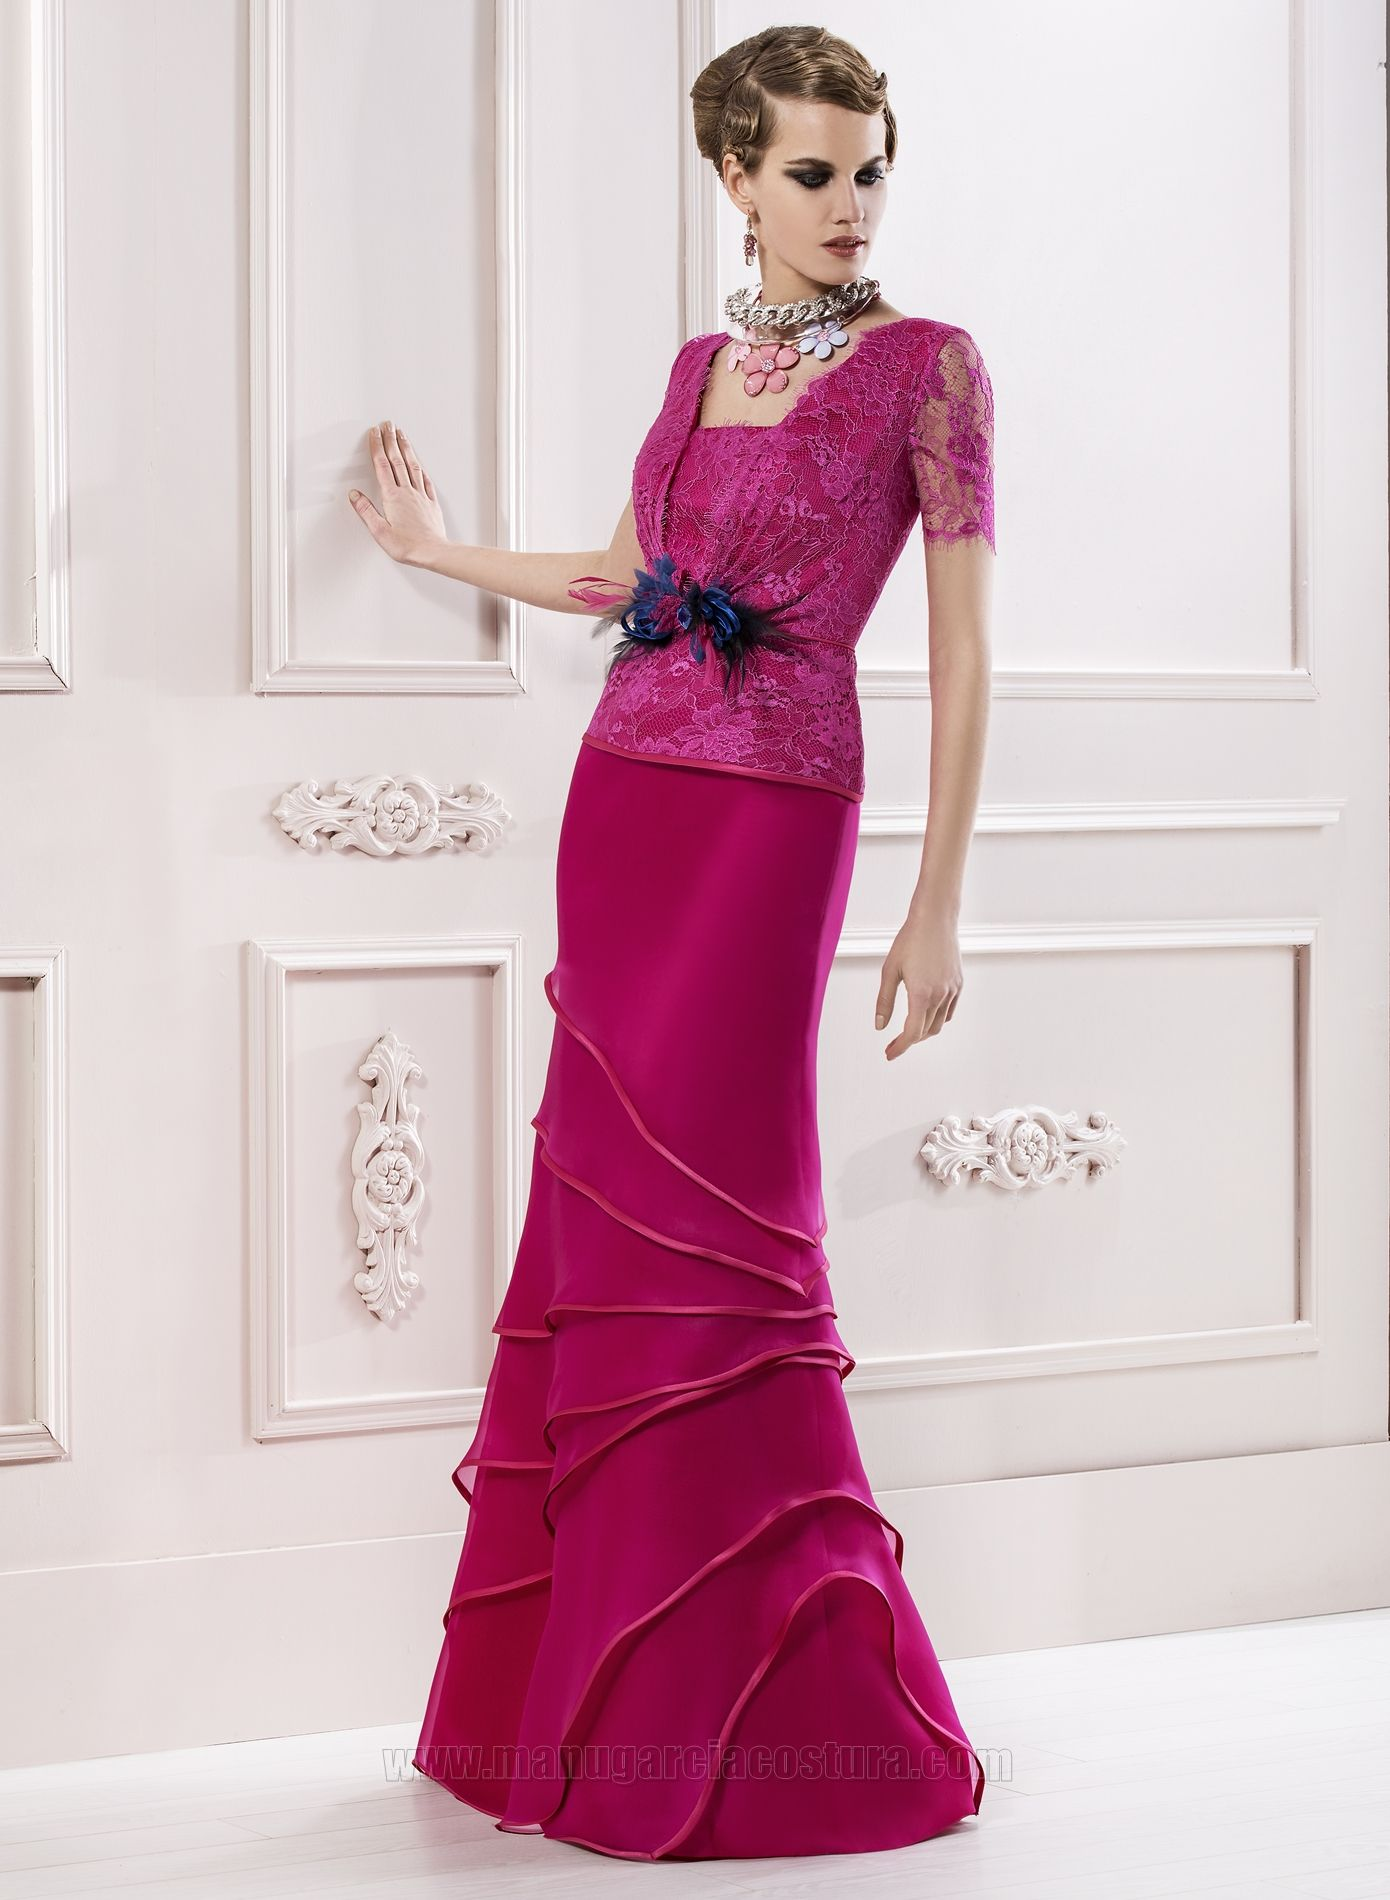 Vestidos de fiesta 2014 | Manu Garcia | MANU GARCIA | Pinterest ...